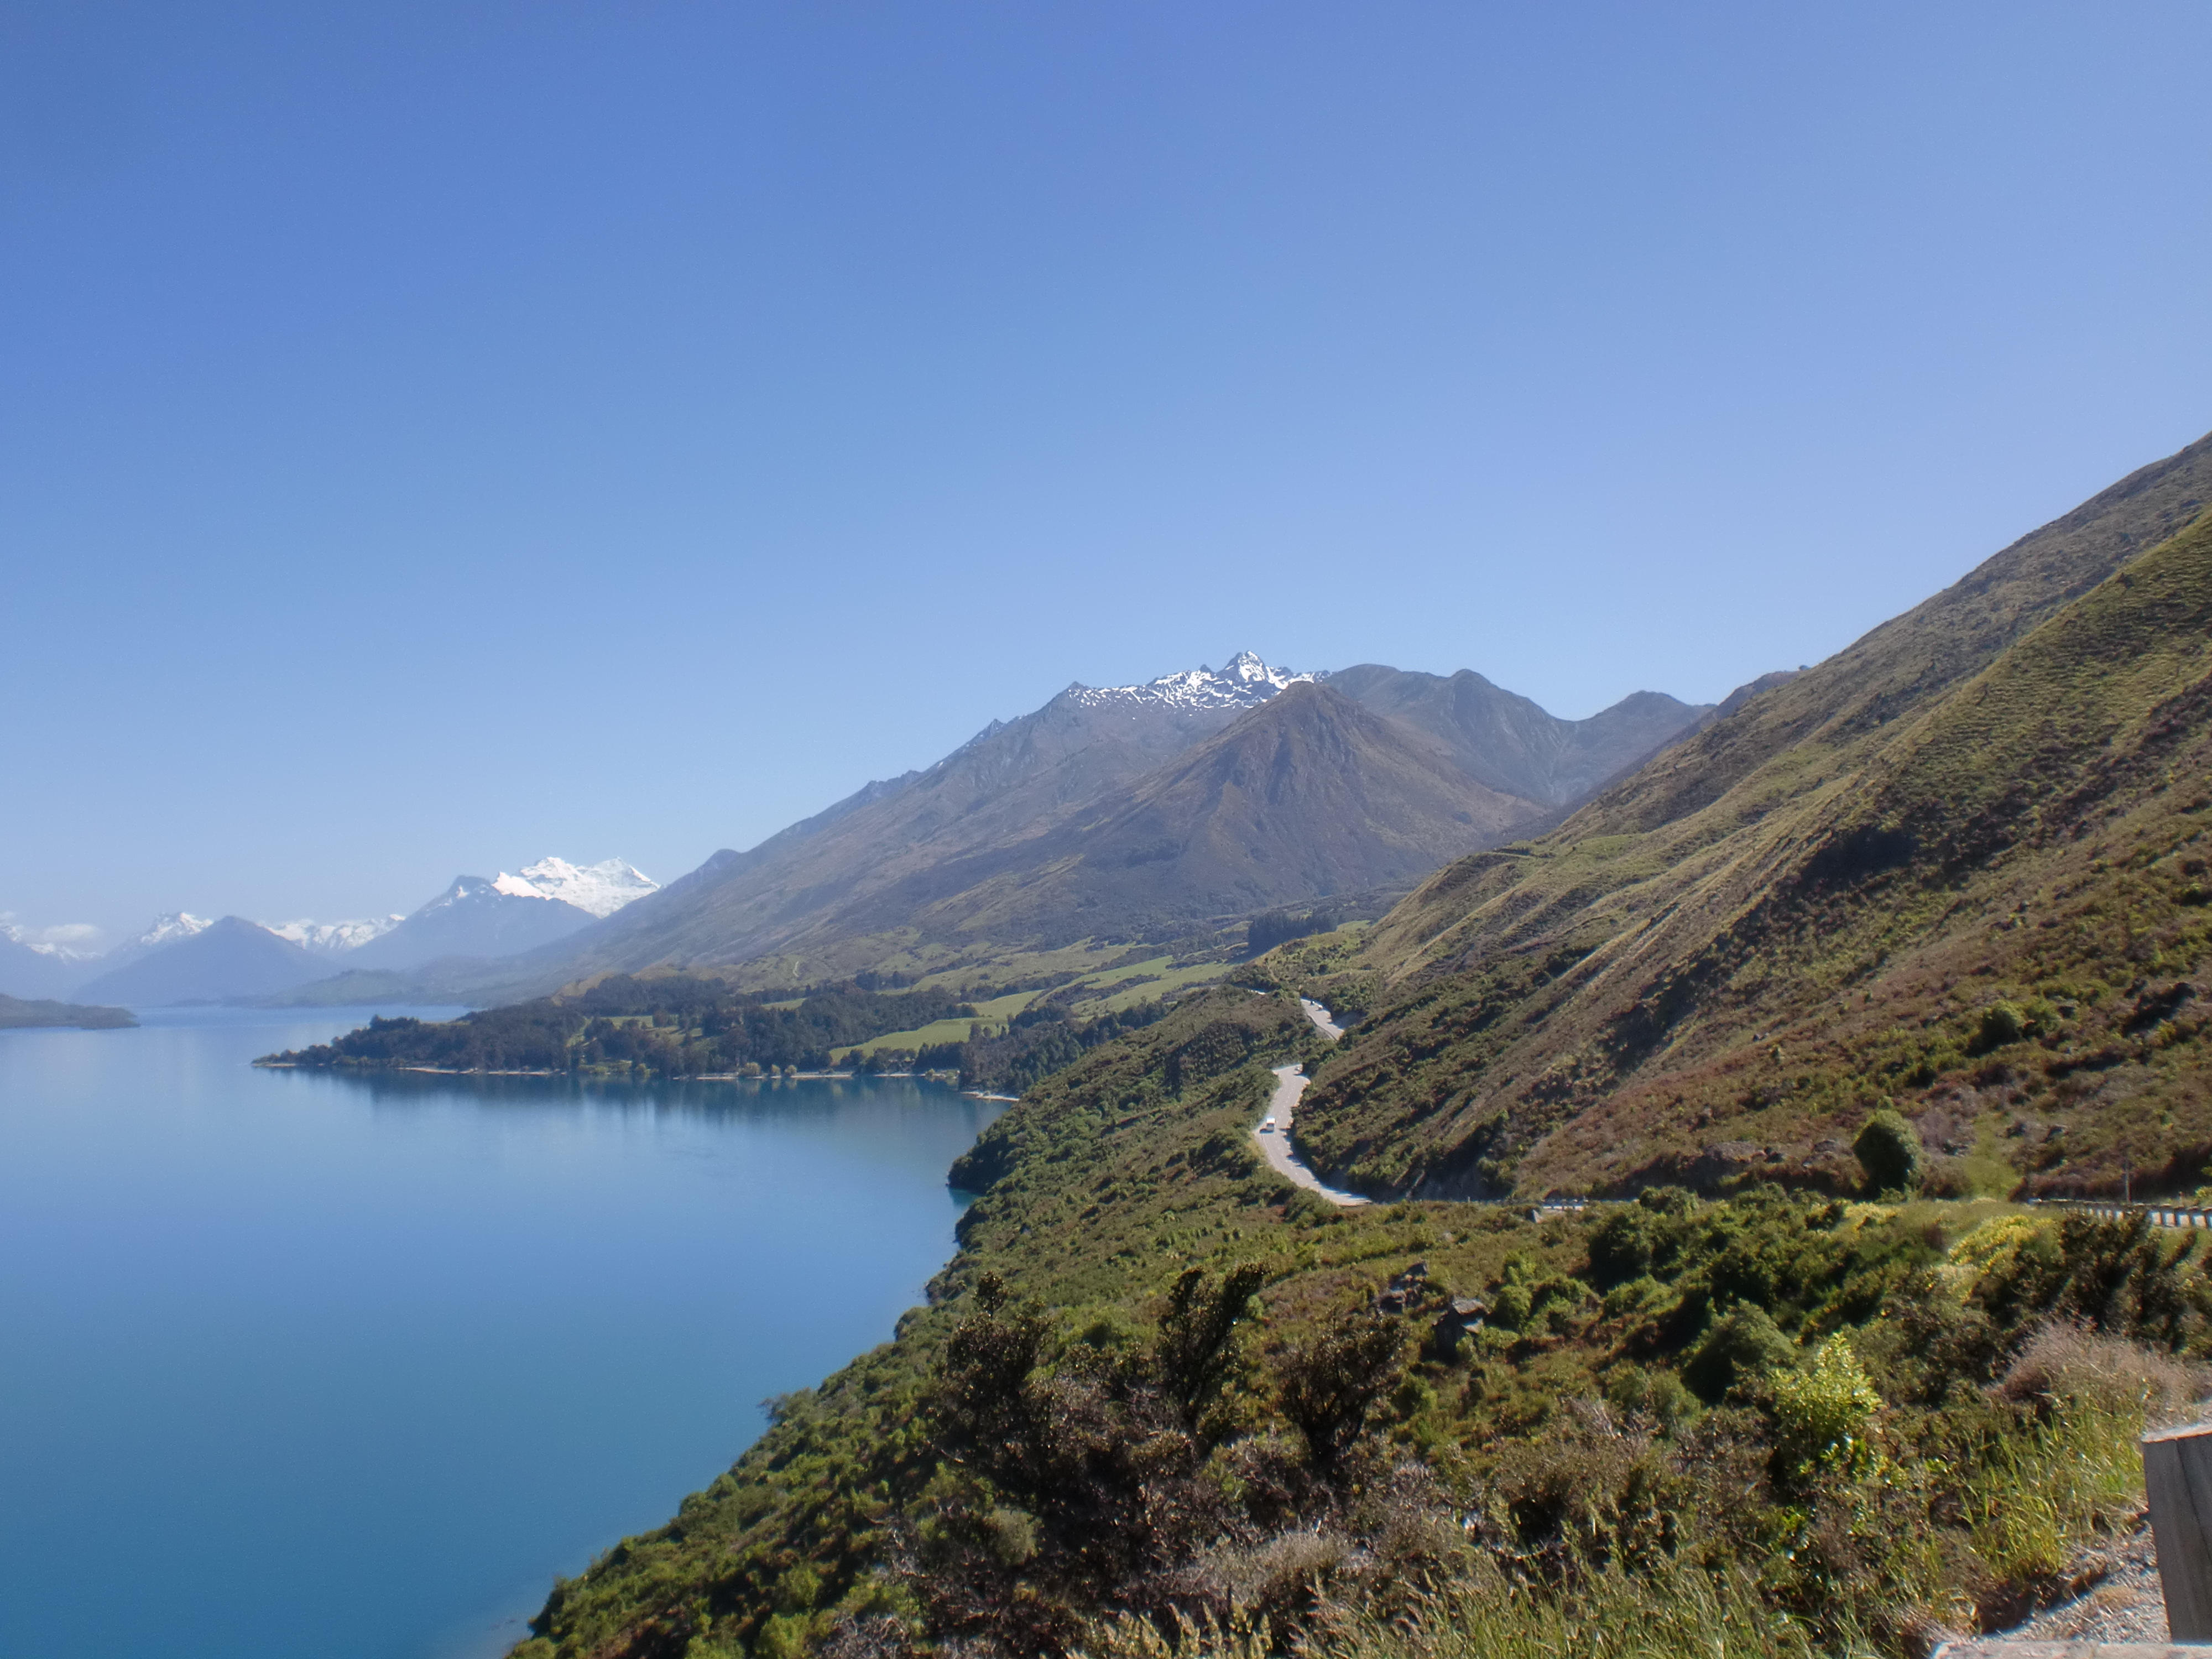 Pelaku Penembakan Di New Zealand Image: Dream Takes You Anywhere